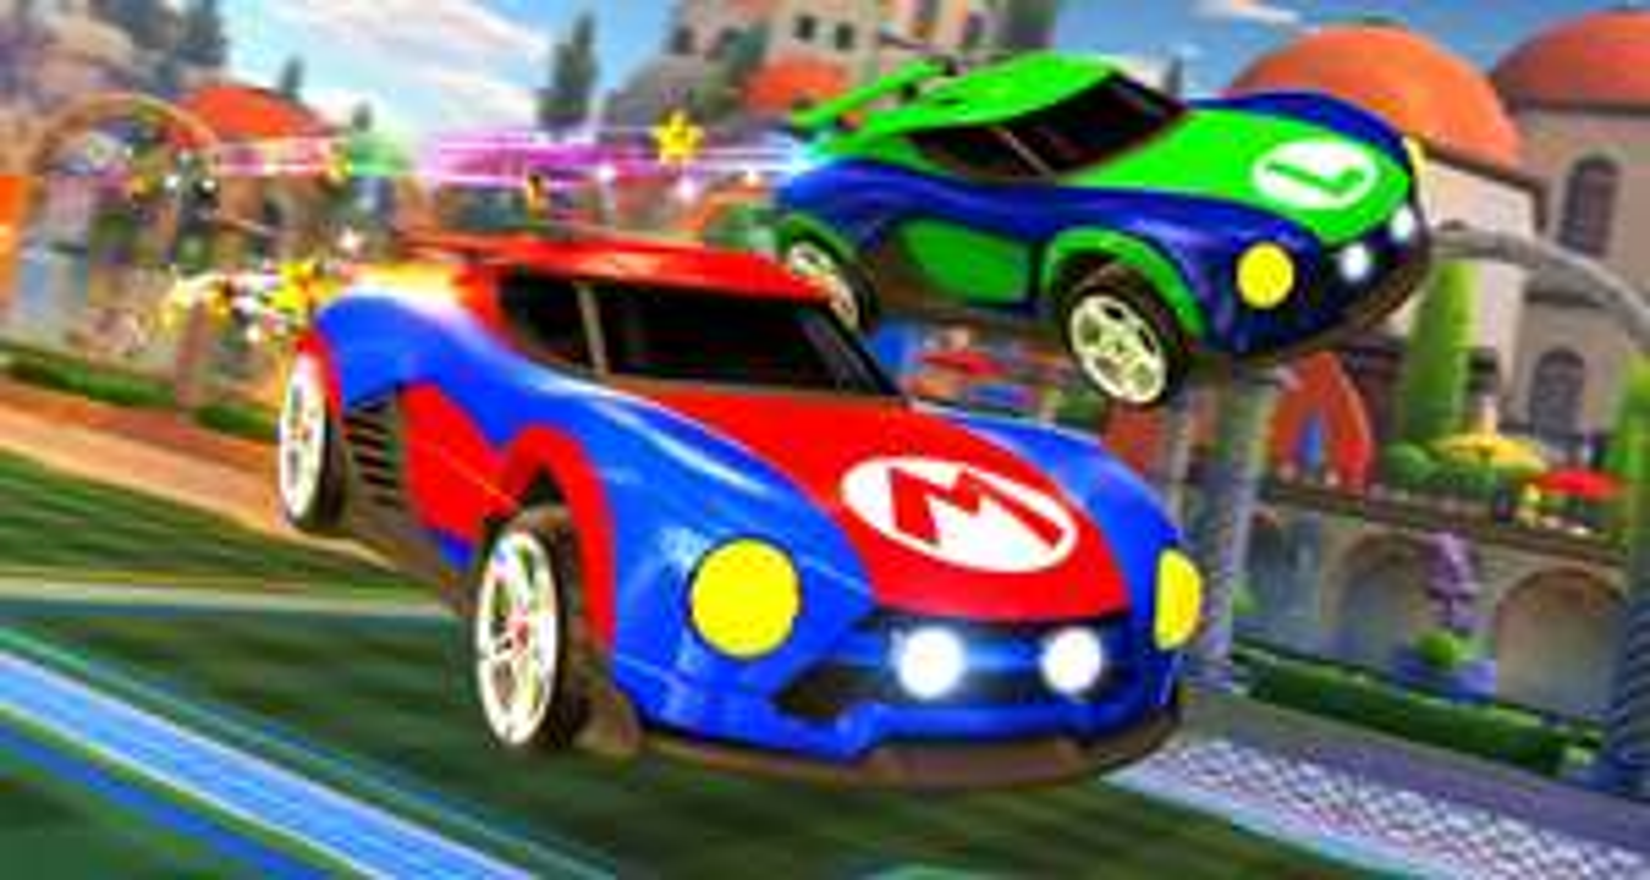 Rocket League Nintendo Switch eShop black Friday - £9